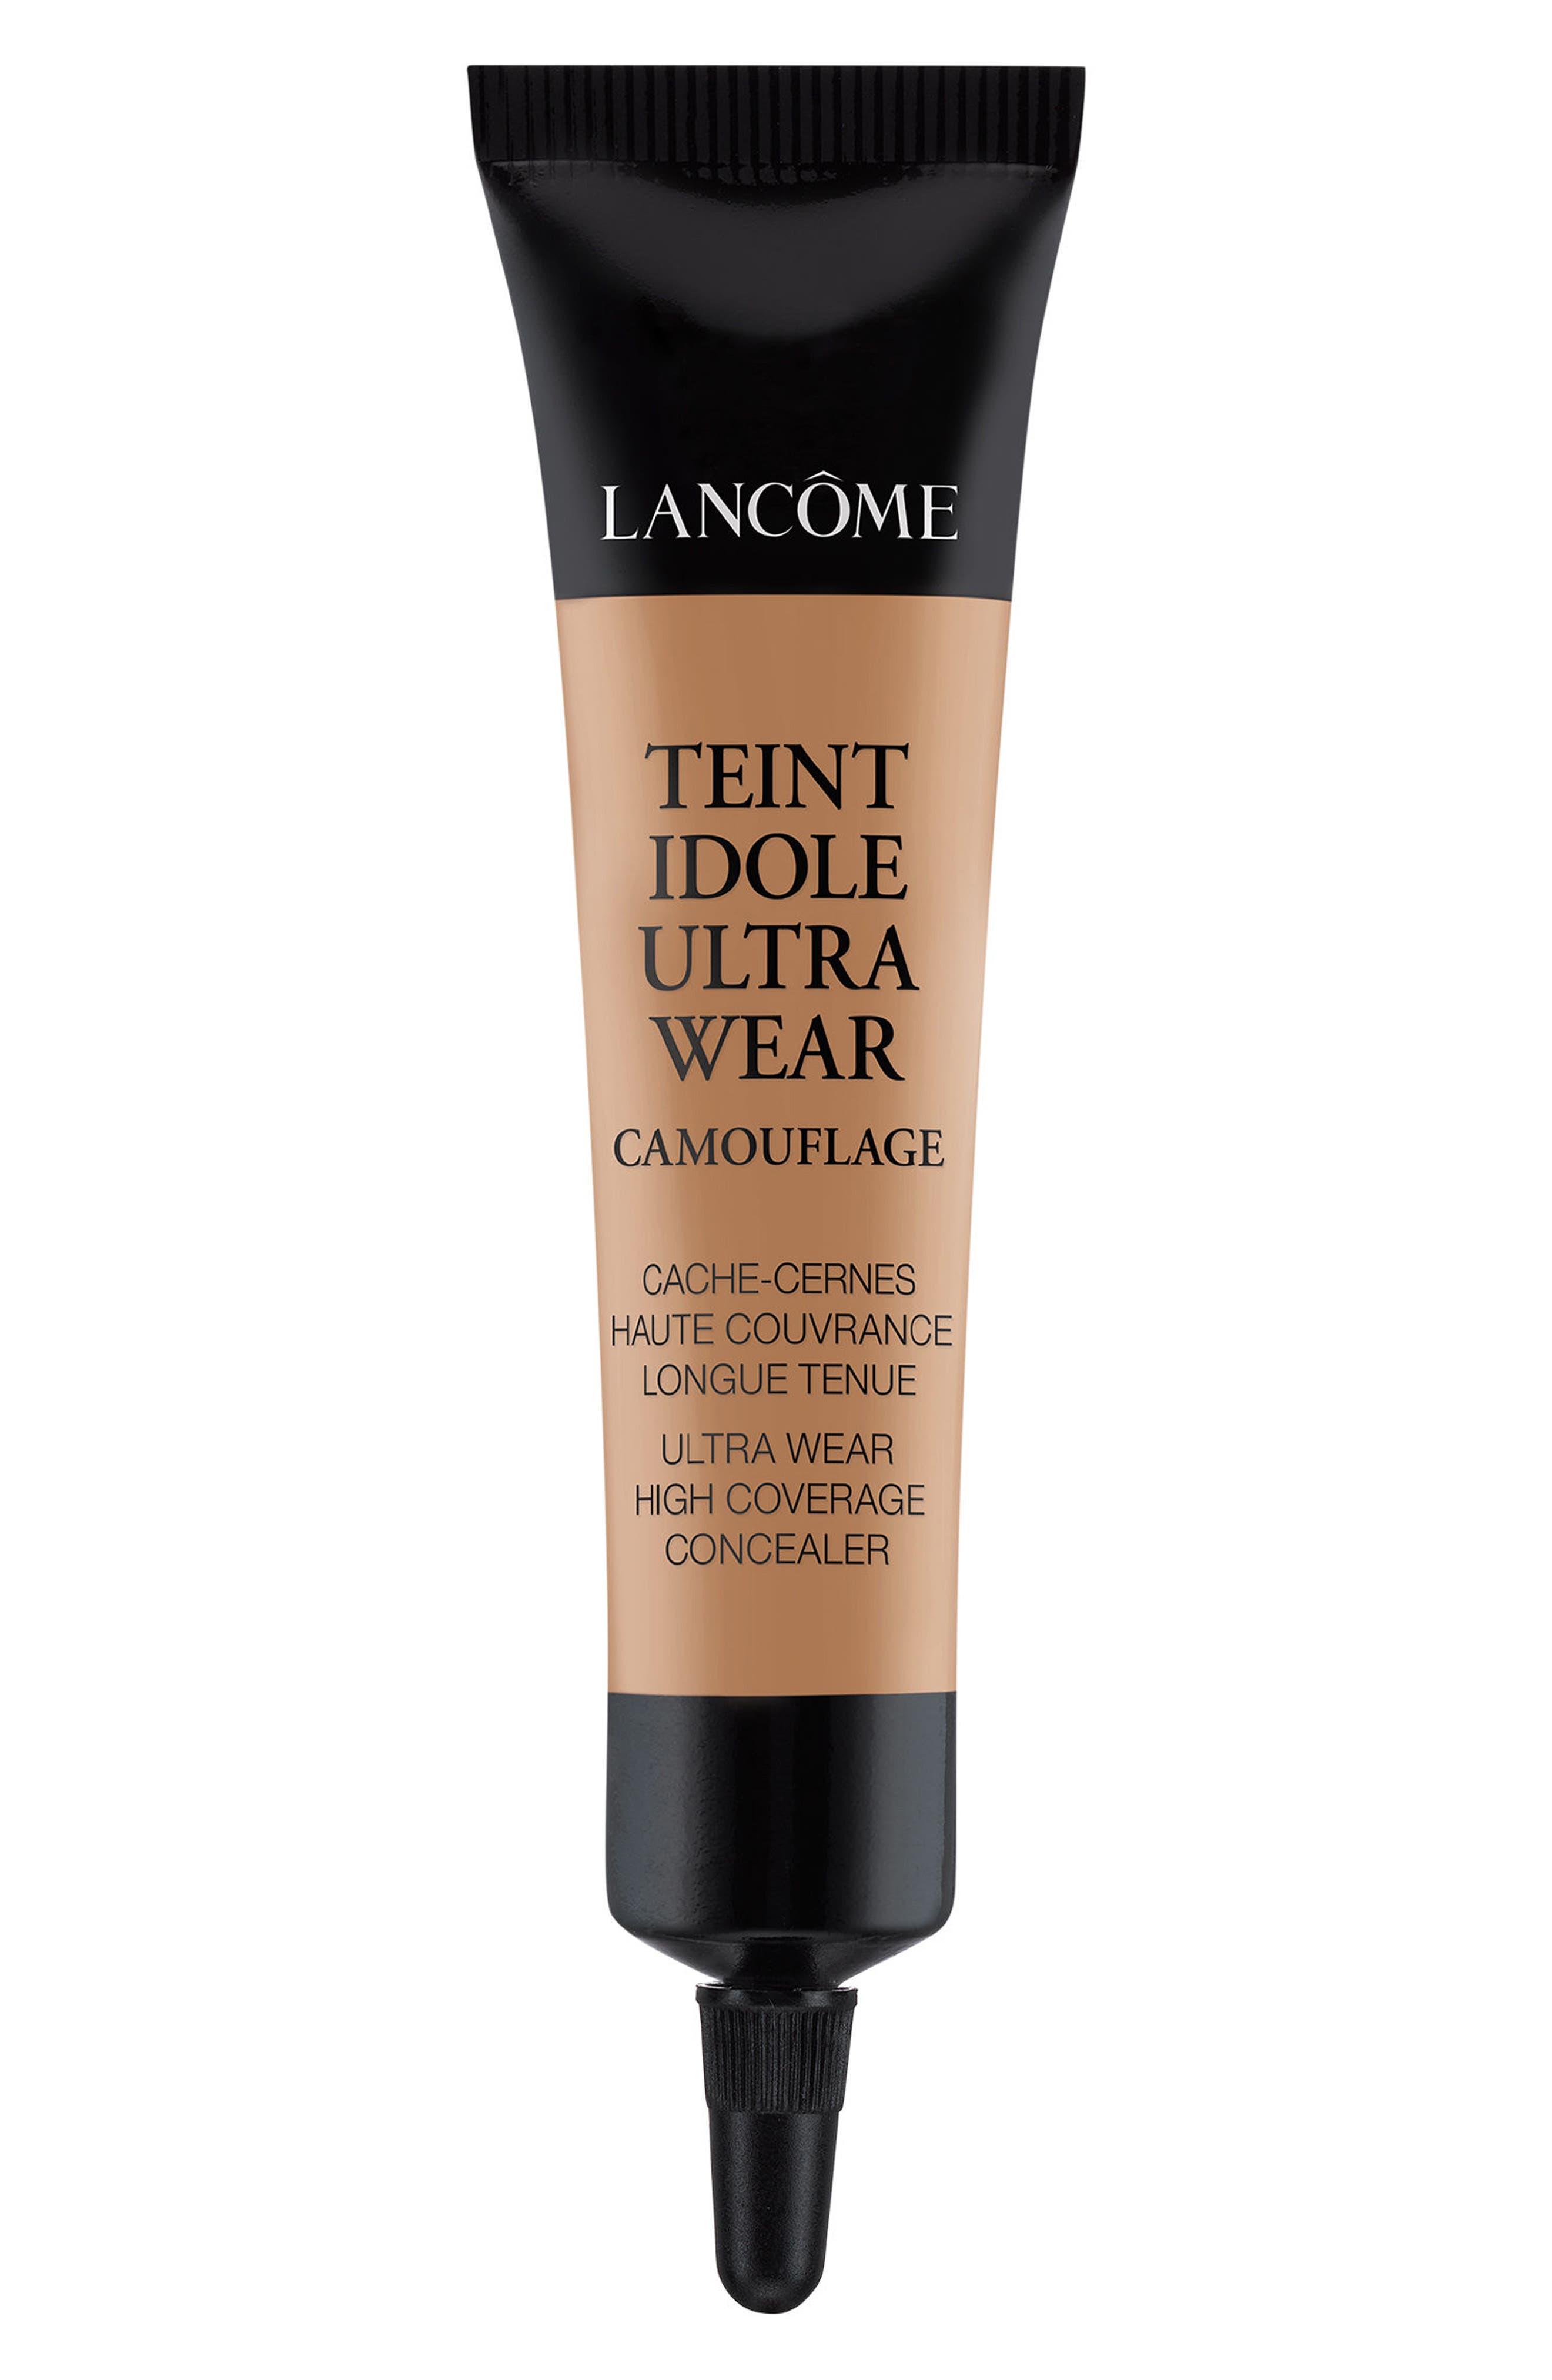 Alternate Image 1 Selected - Lancôme Teint Idole Ultra Wear Camouflage Concealer